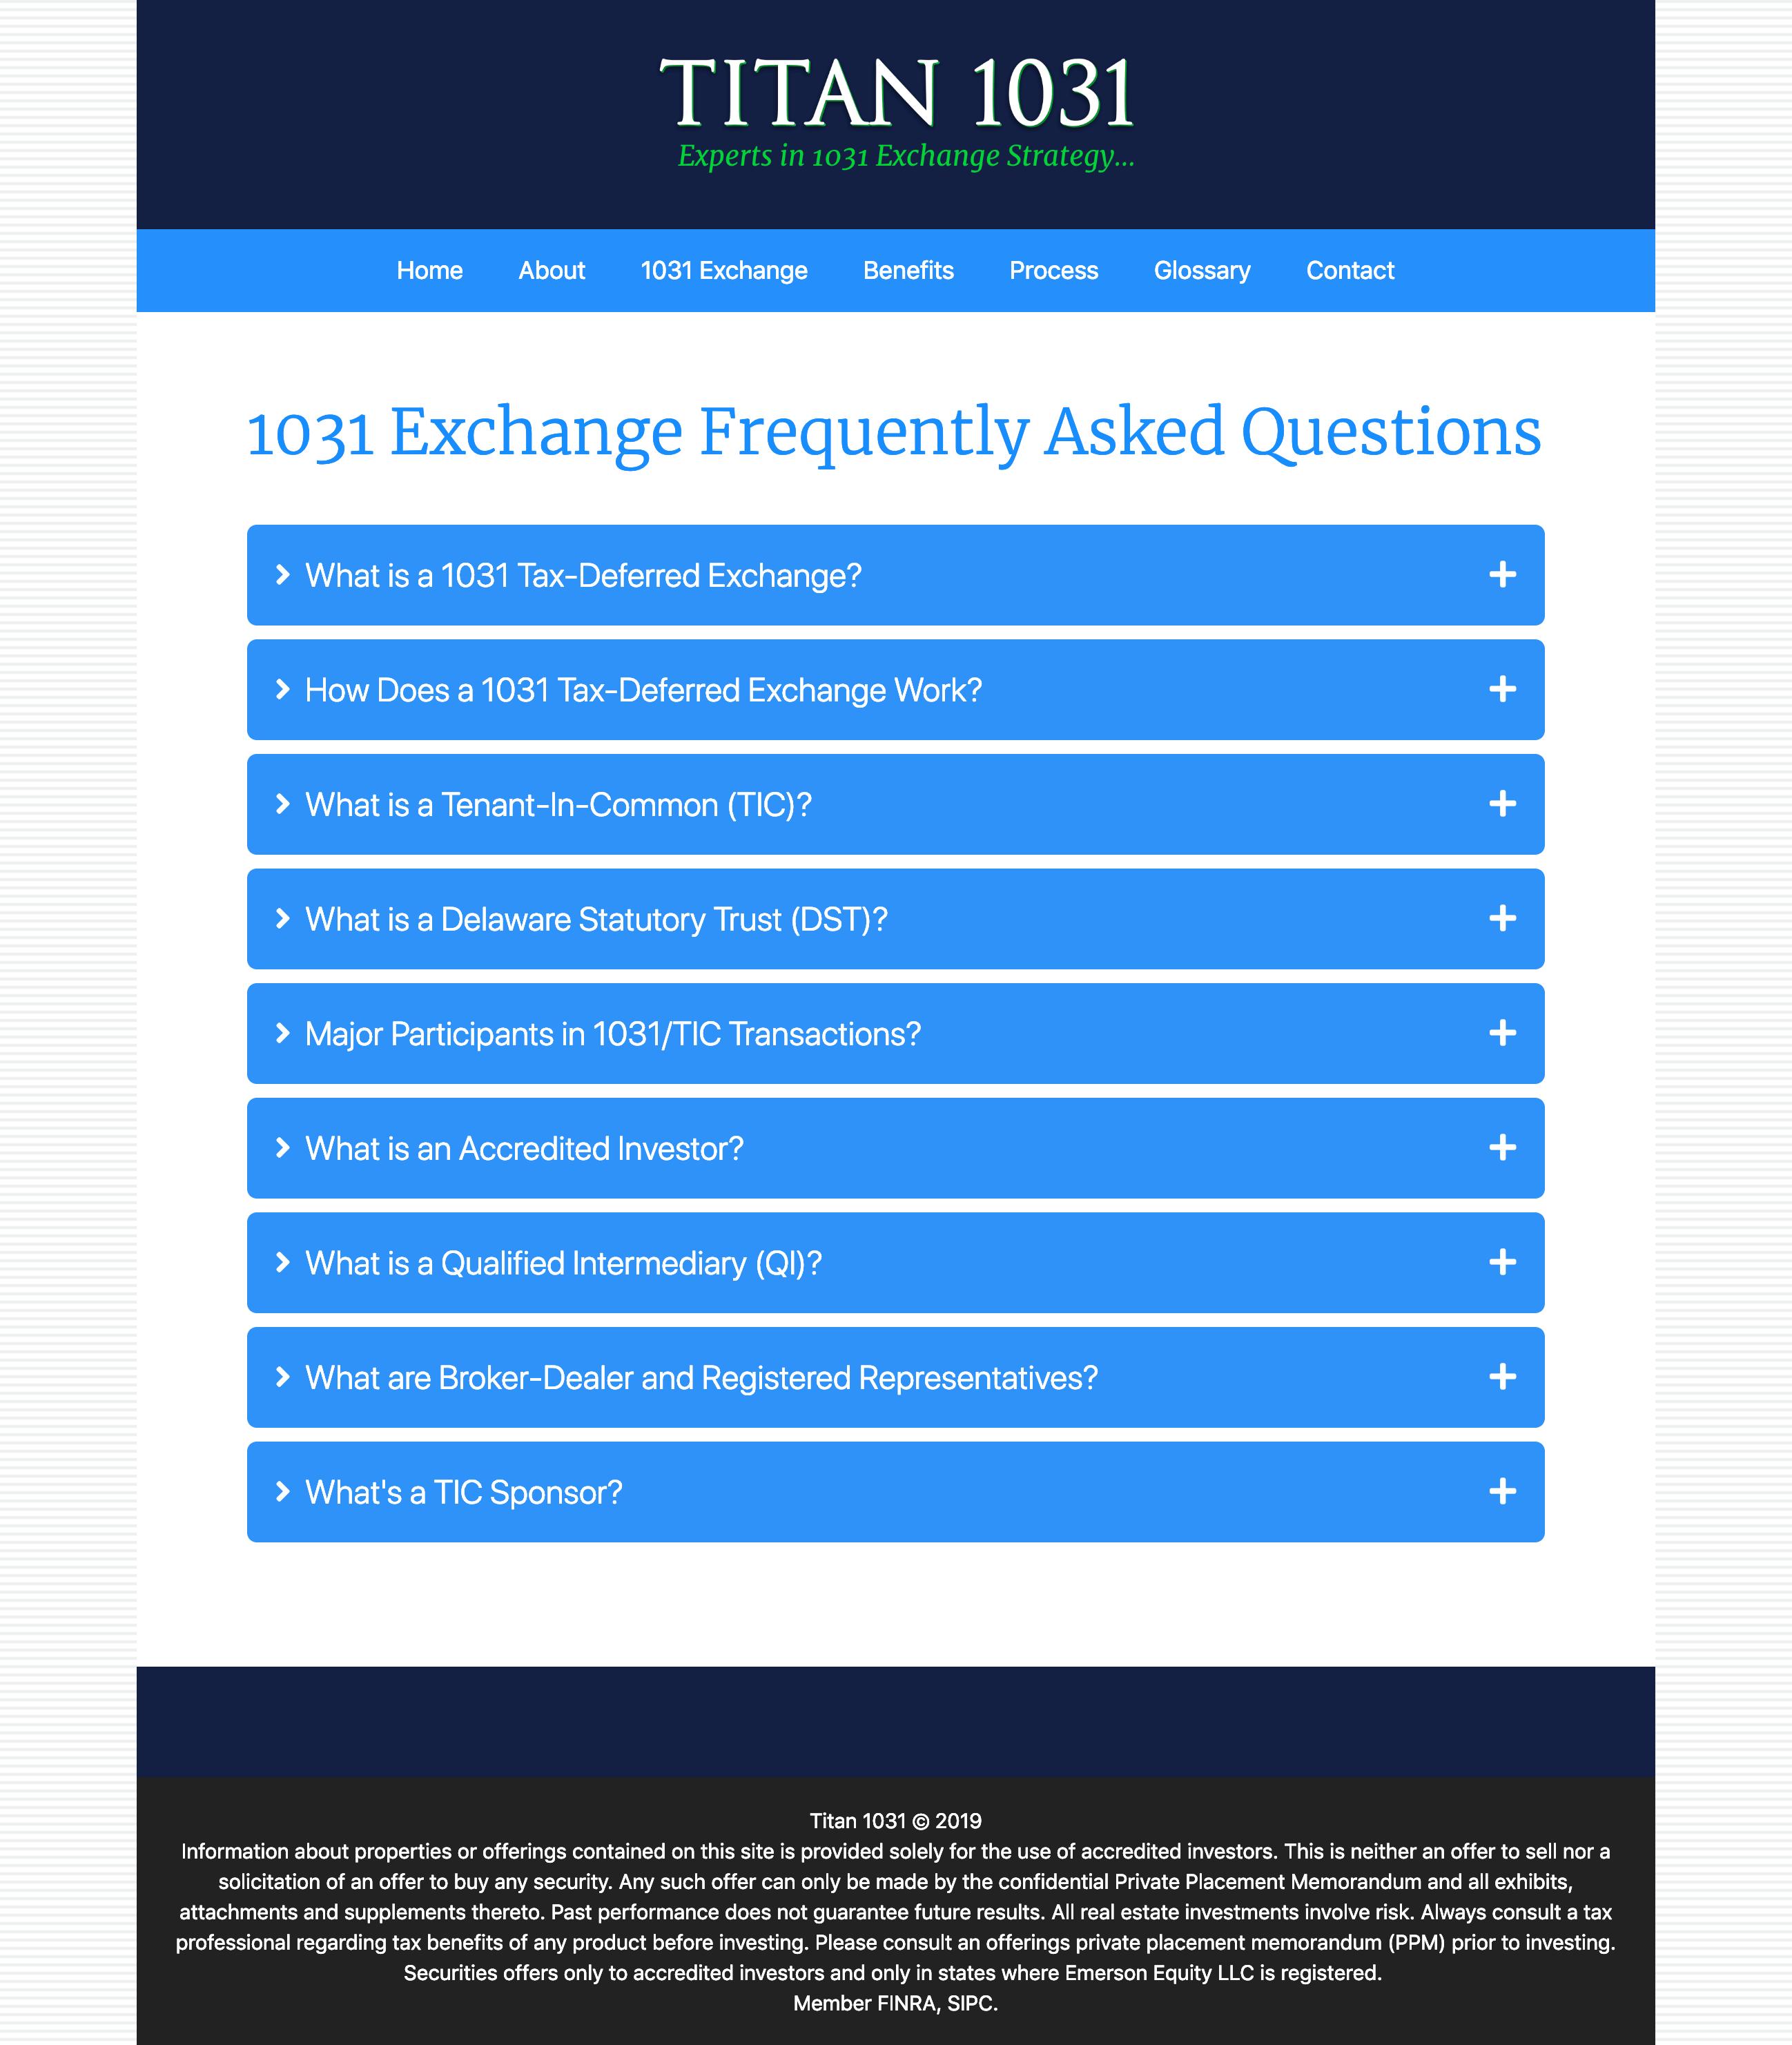 Titan-1031-Real-Estate-Exchange-Website-Design-FAQ-Page